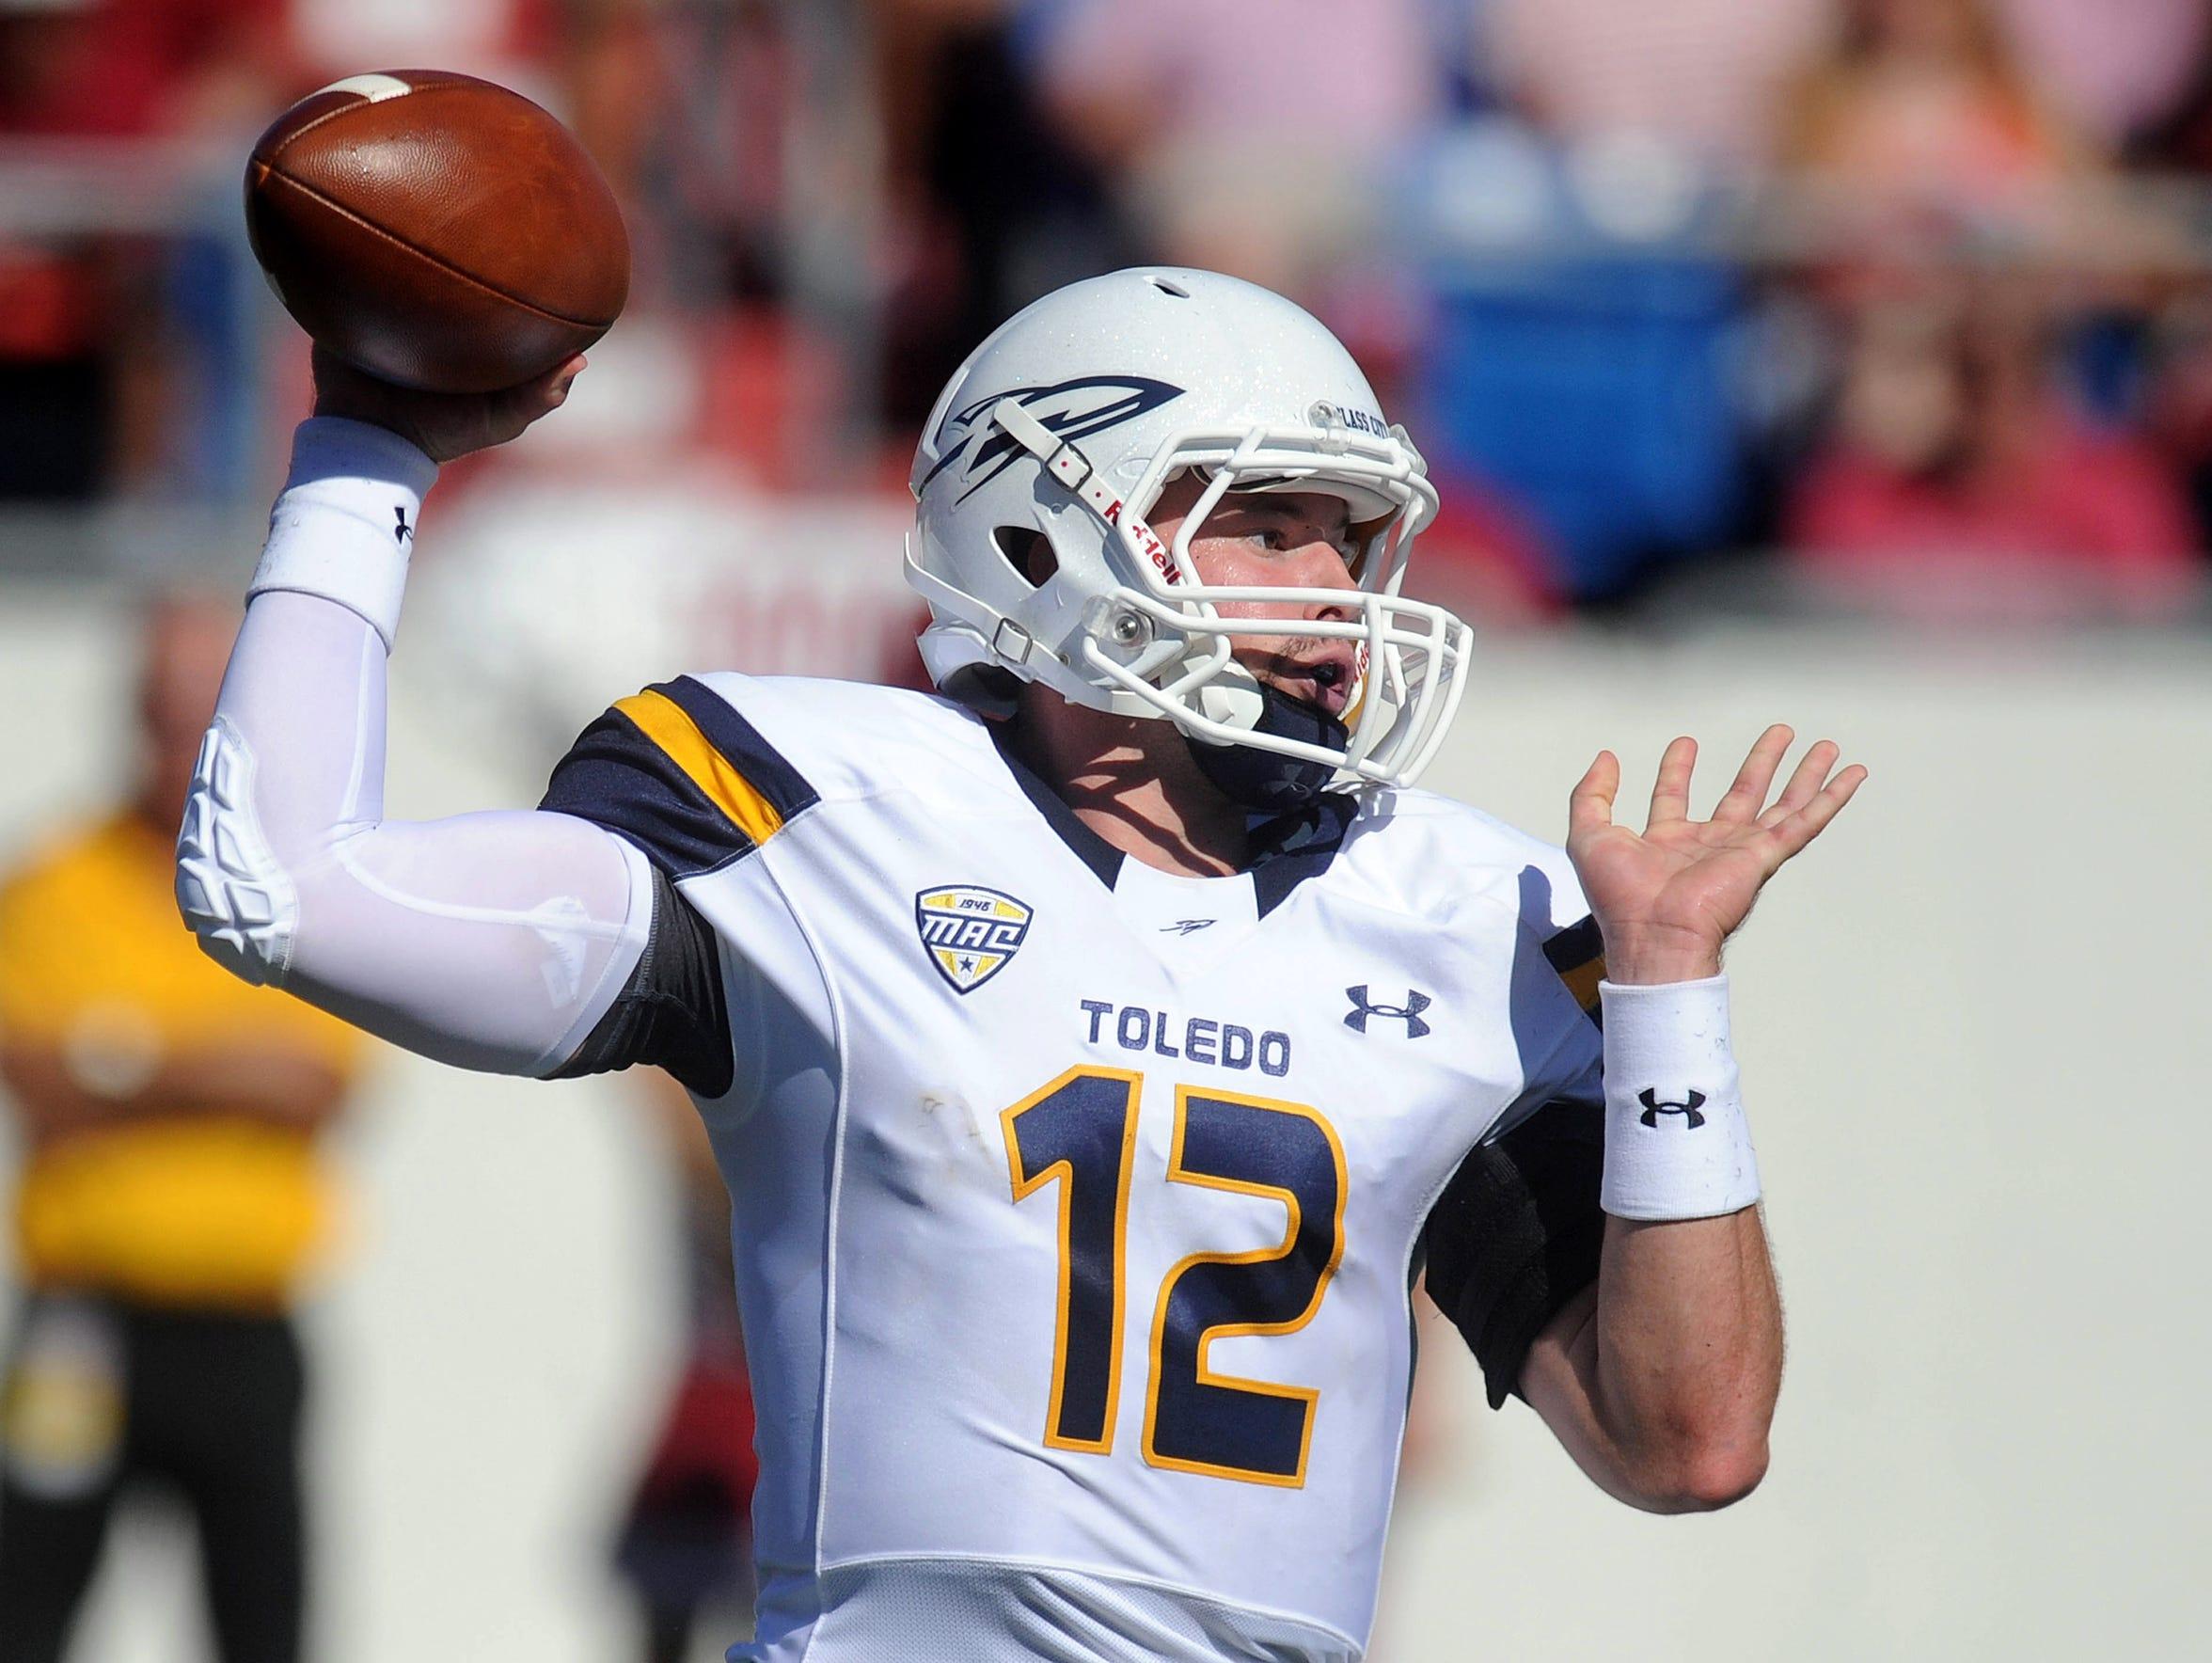 Toledo quarterback Phillip Ely (12) had a mistake-free